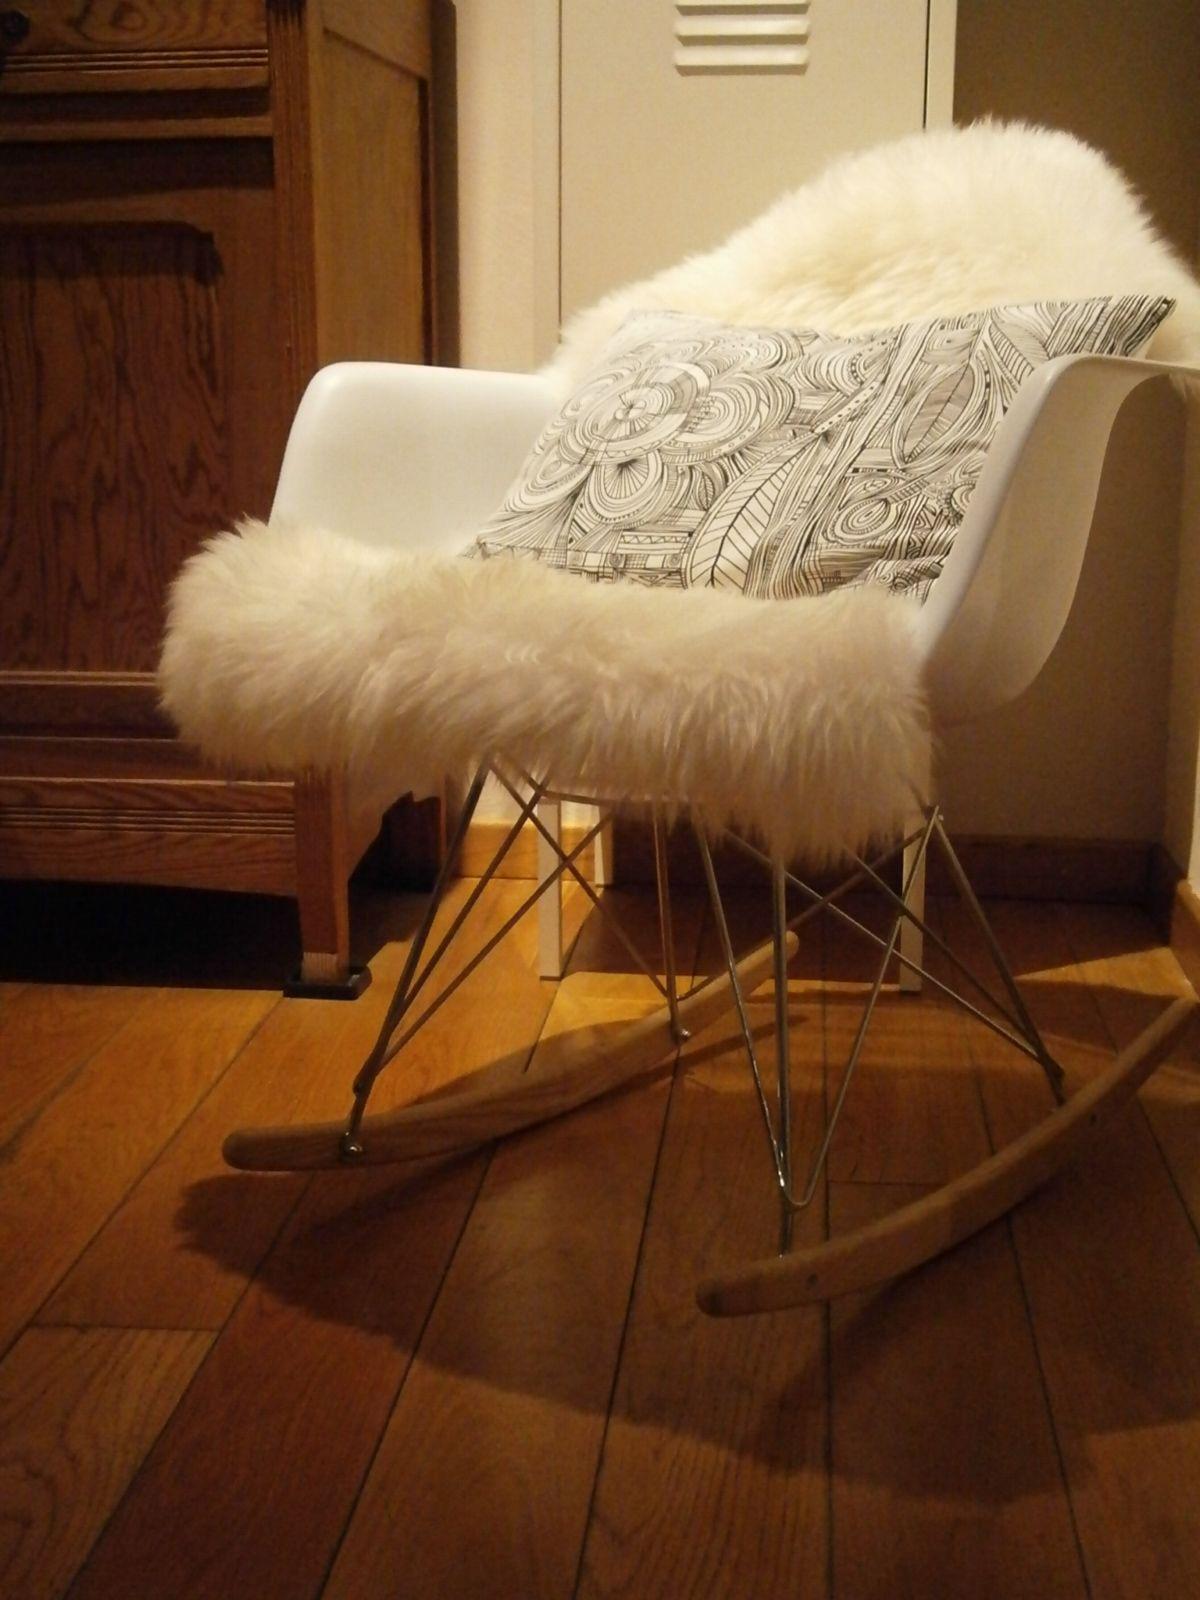 chaise peau de coussin with chaise jules ikea. Black Bedroom Furniture Sets. Home Design Ideas